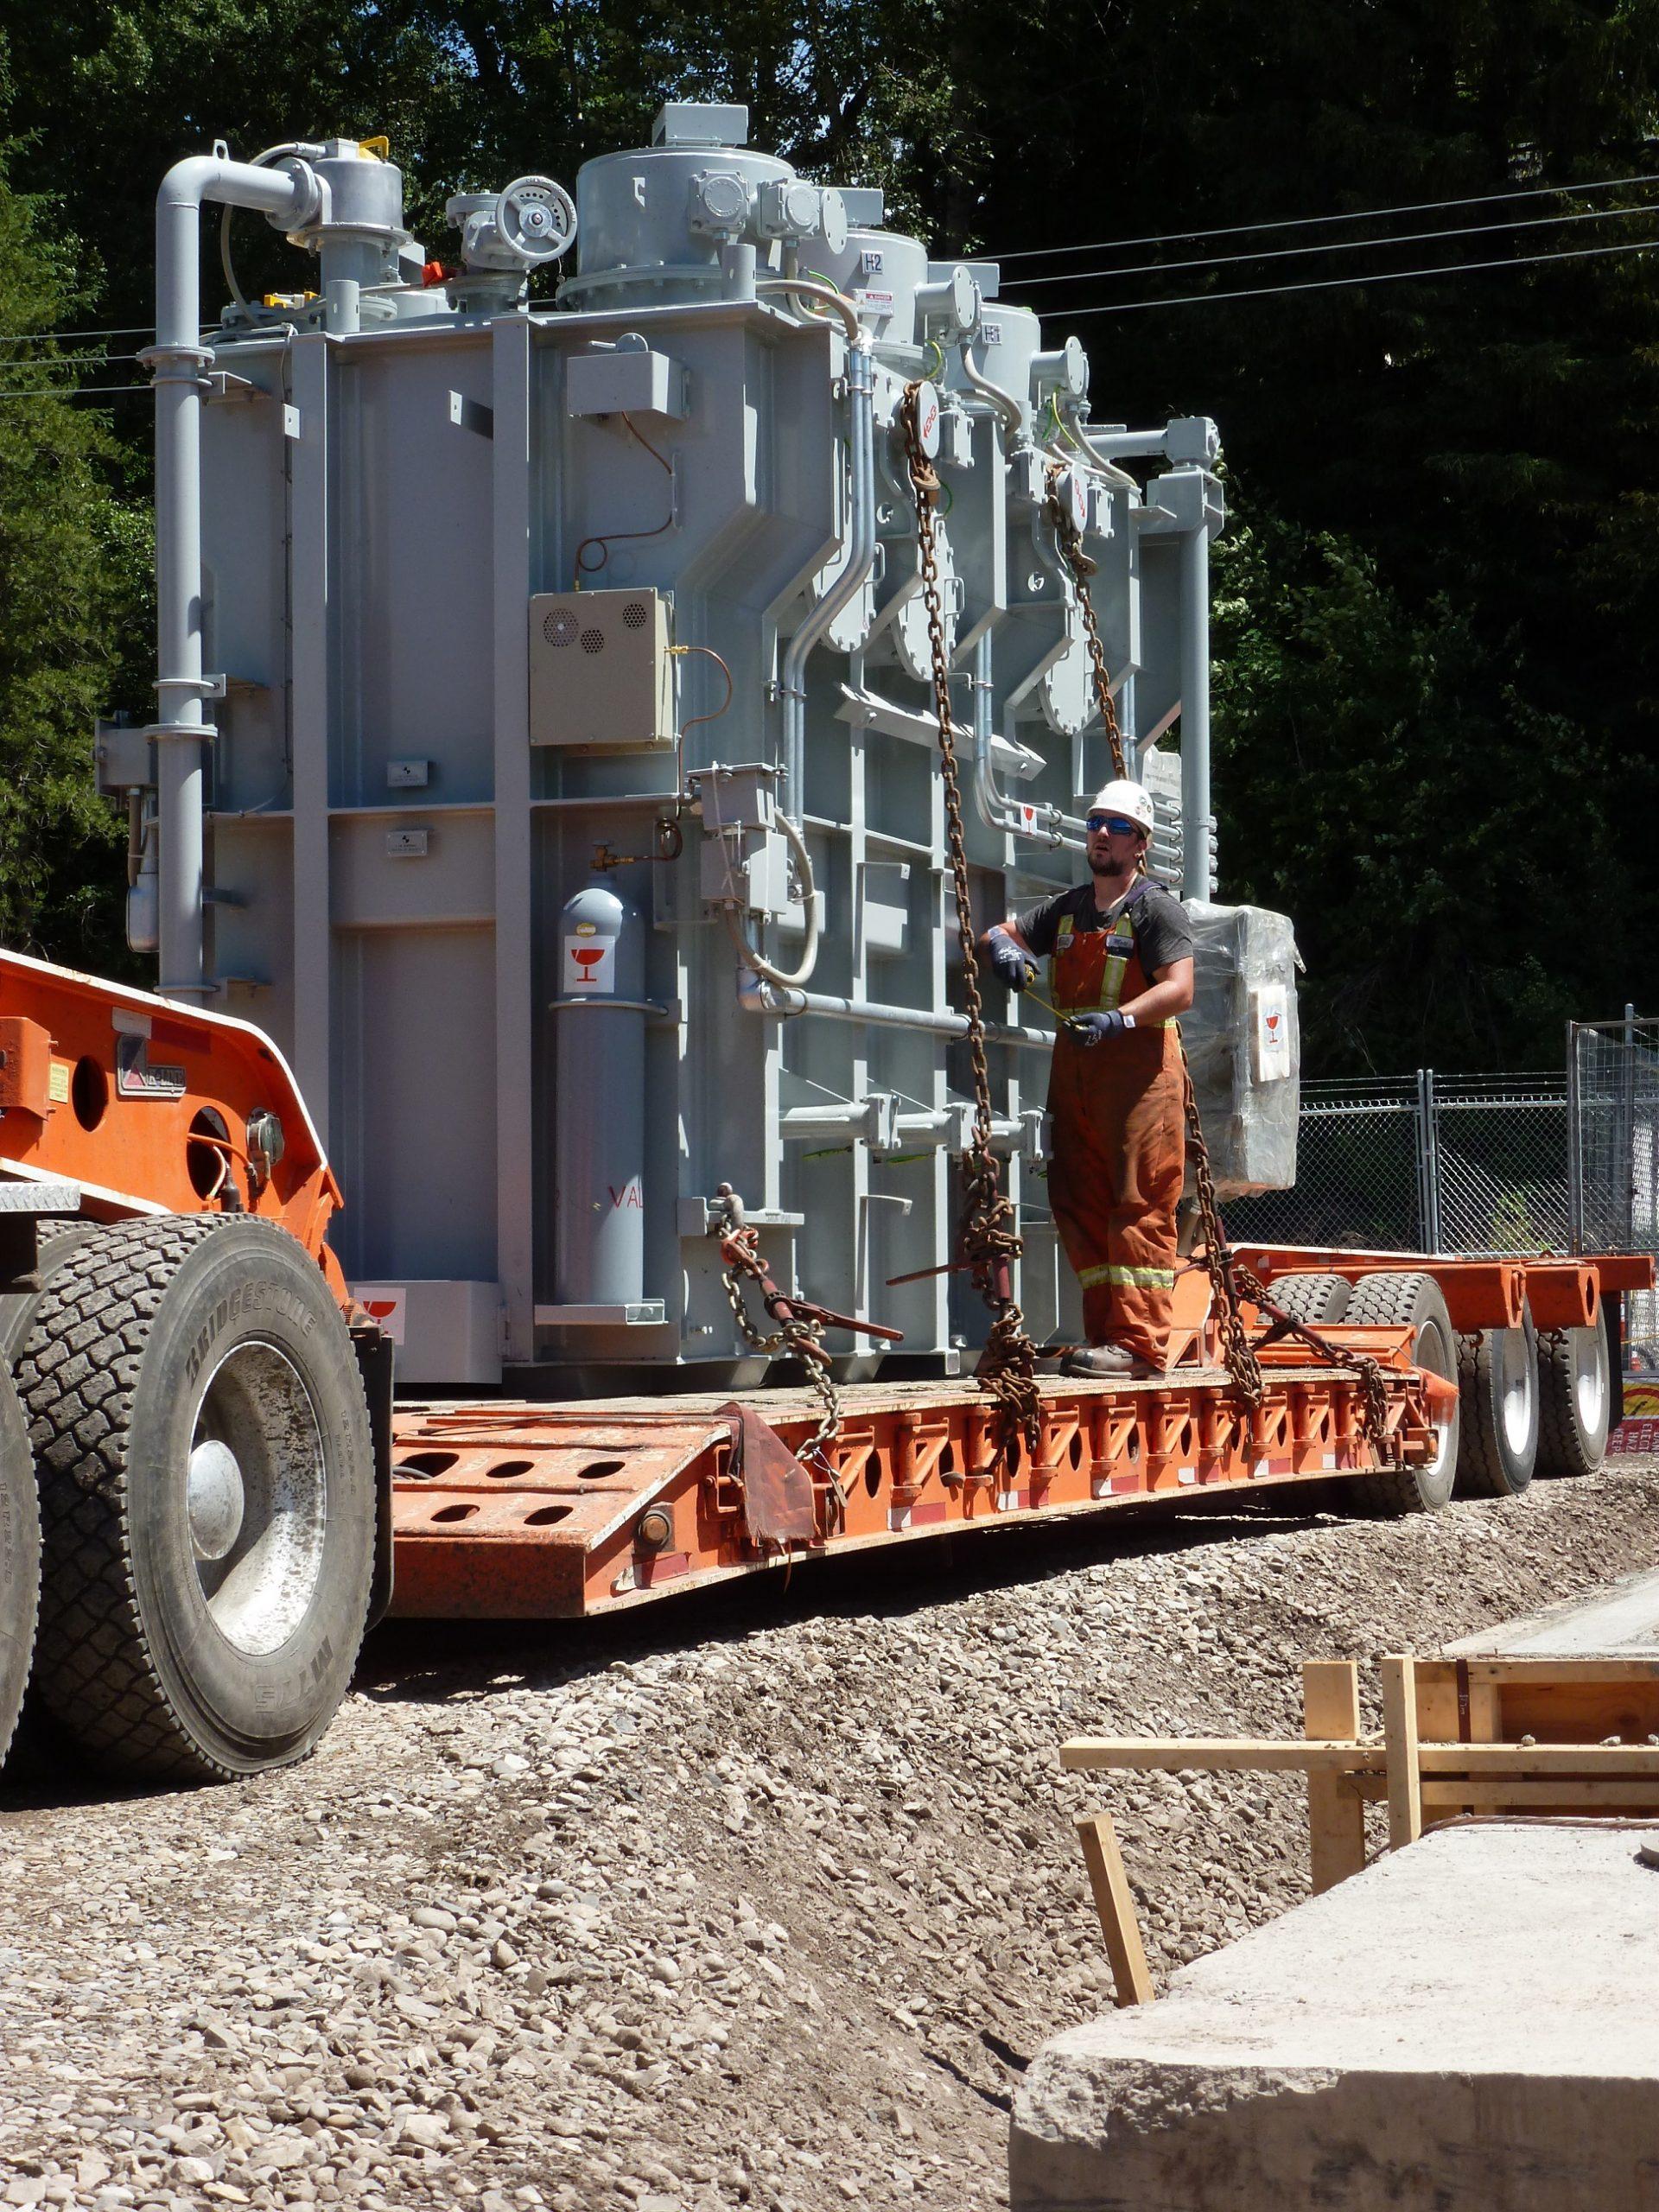 New transformer arrives at Fernie substation